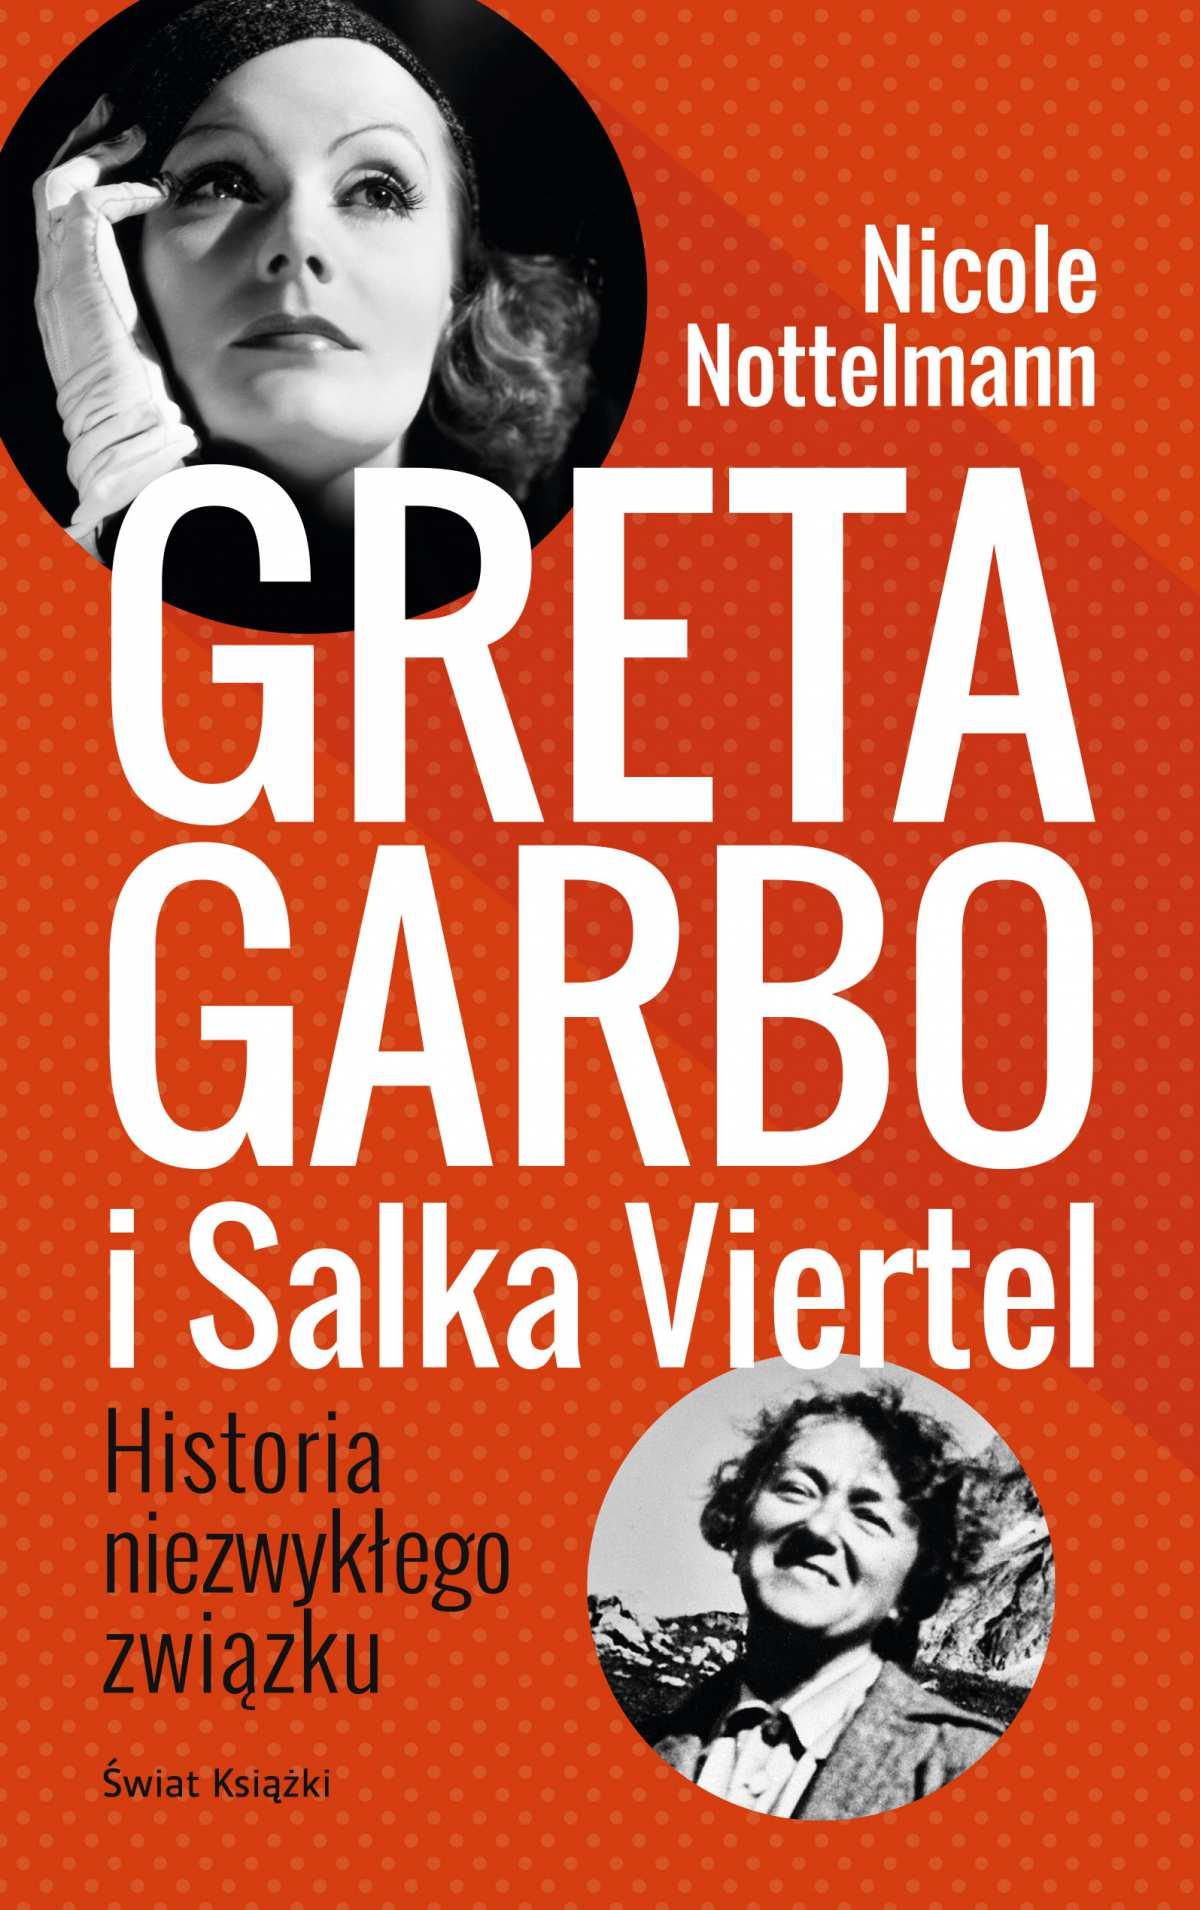 Greta Garbo i Salka Viertel - Ebook (Książka EPUB) do pobrania w formacie EPUB